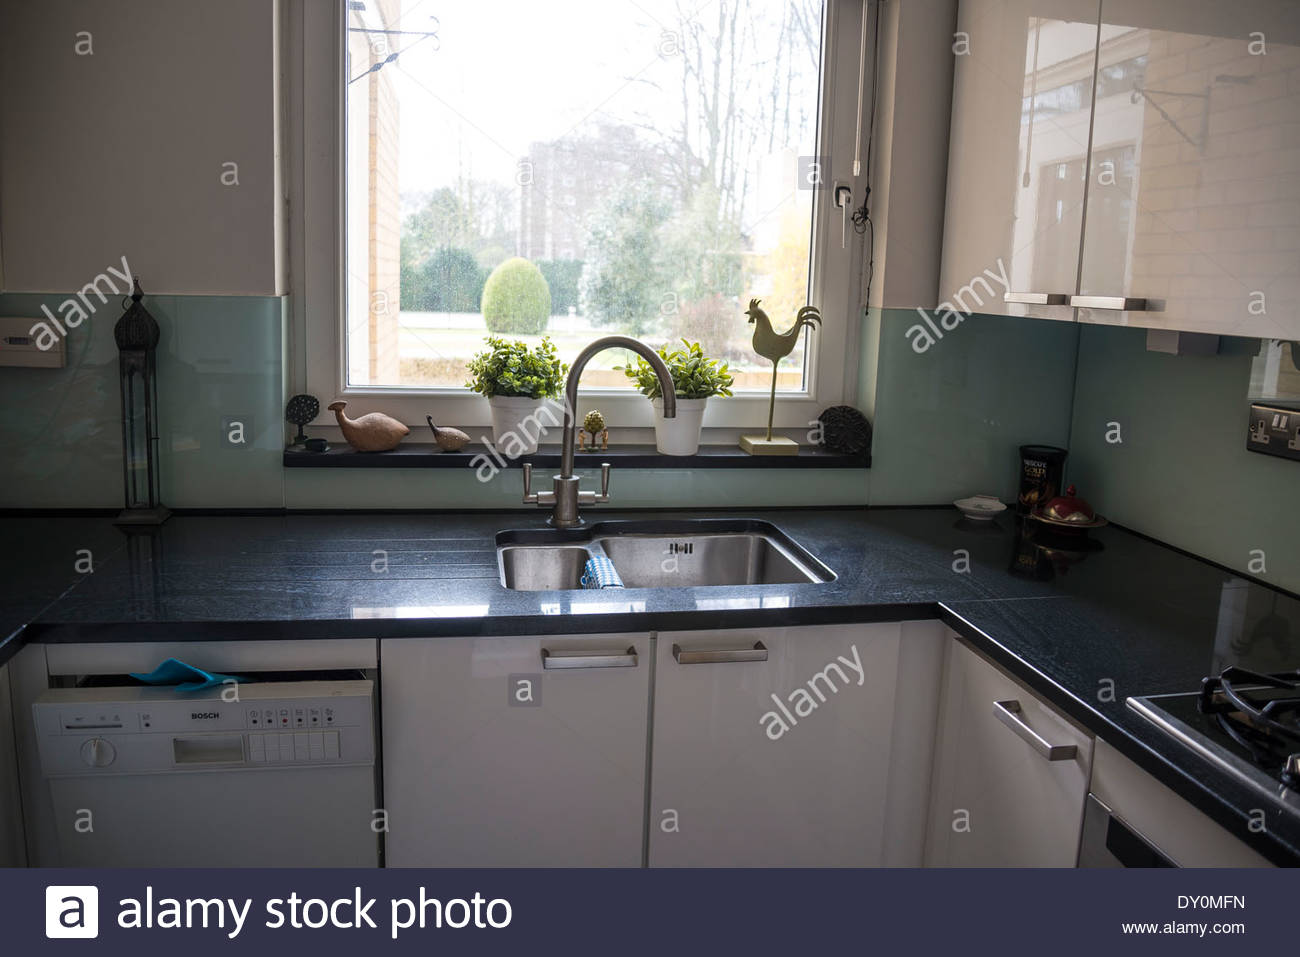 Kitchen sink and window Stock Photo: 68242937 - Alamy